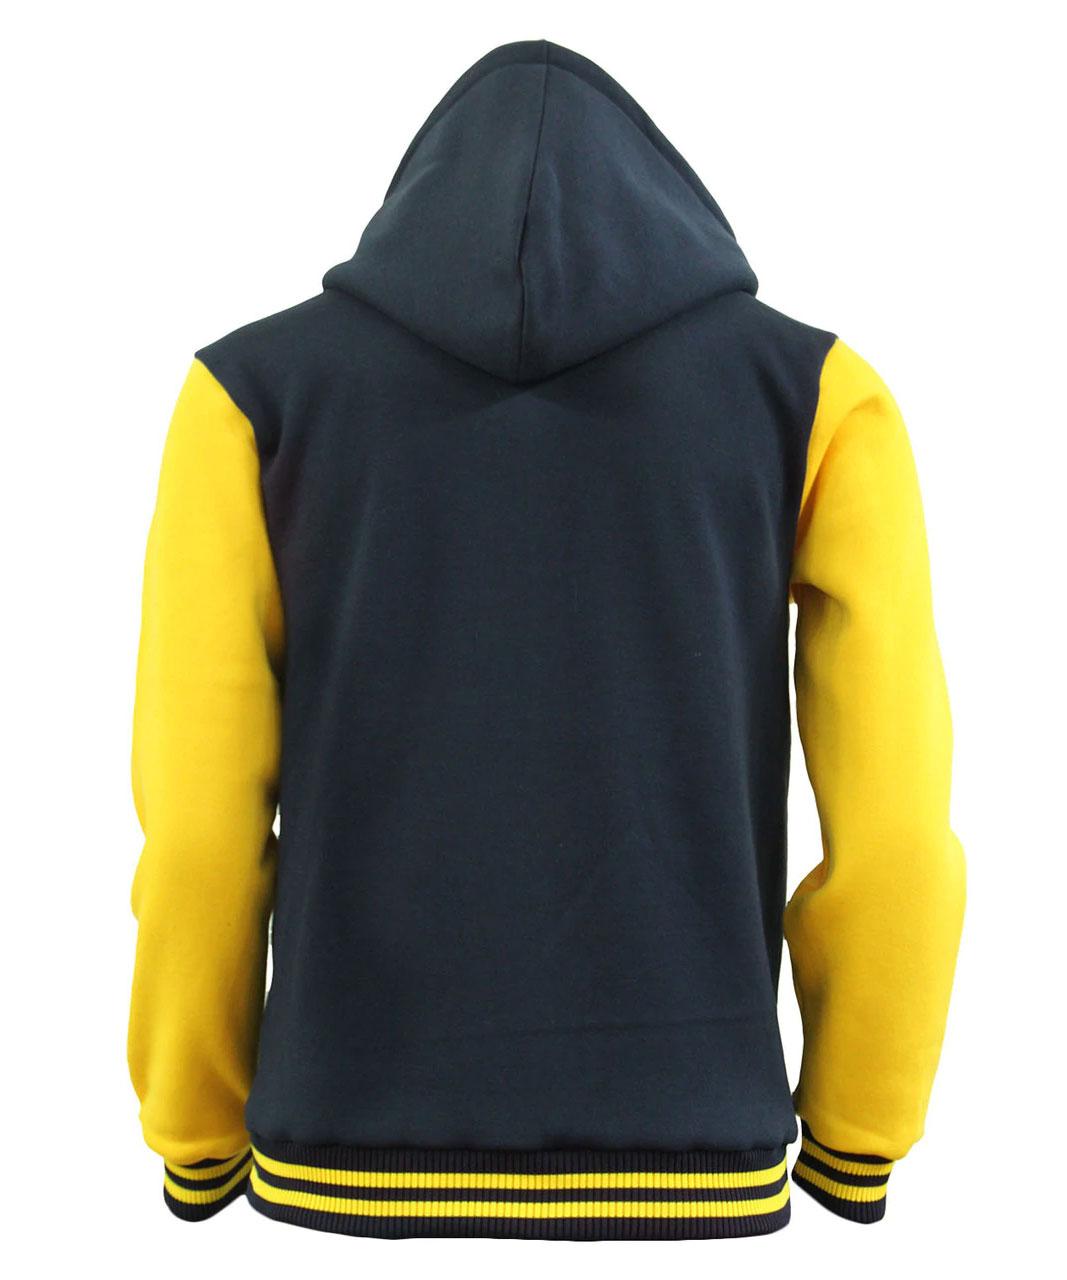 Men's Hoodie Baseball Jacket Varsity Jacket Sweatshirt Letterman Jacket